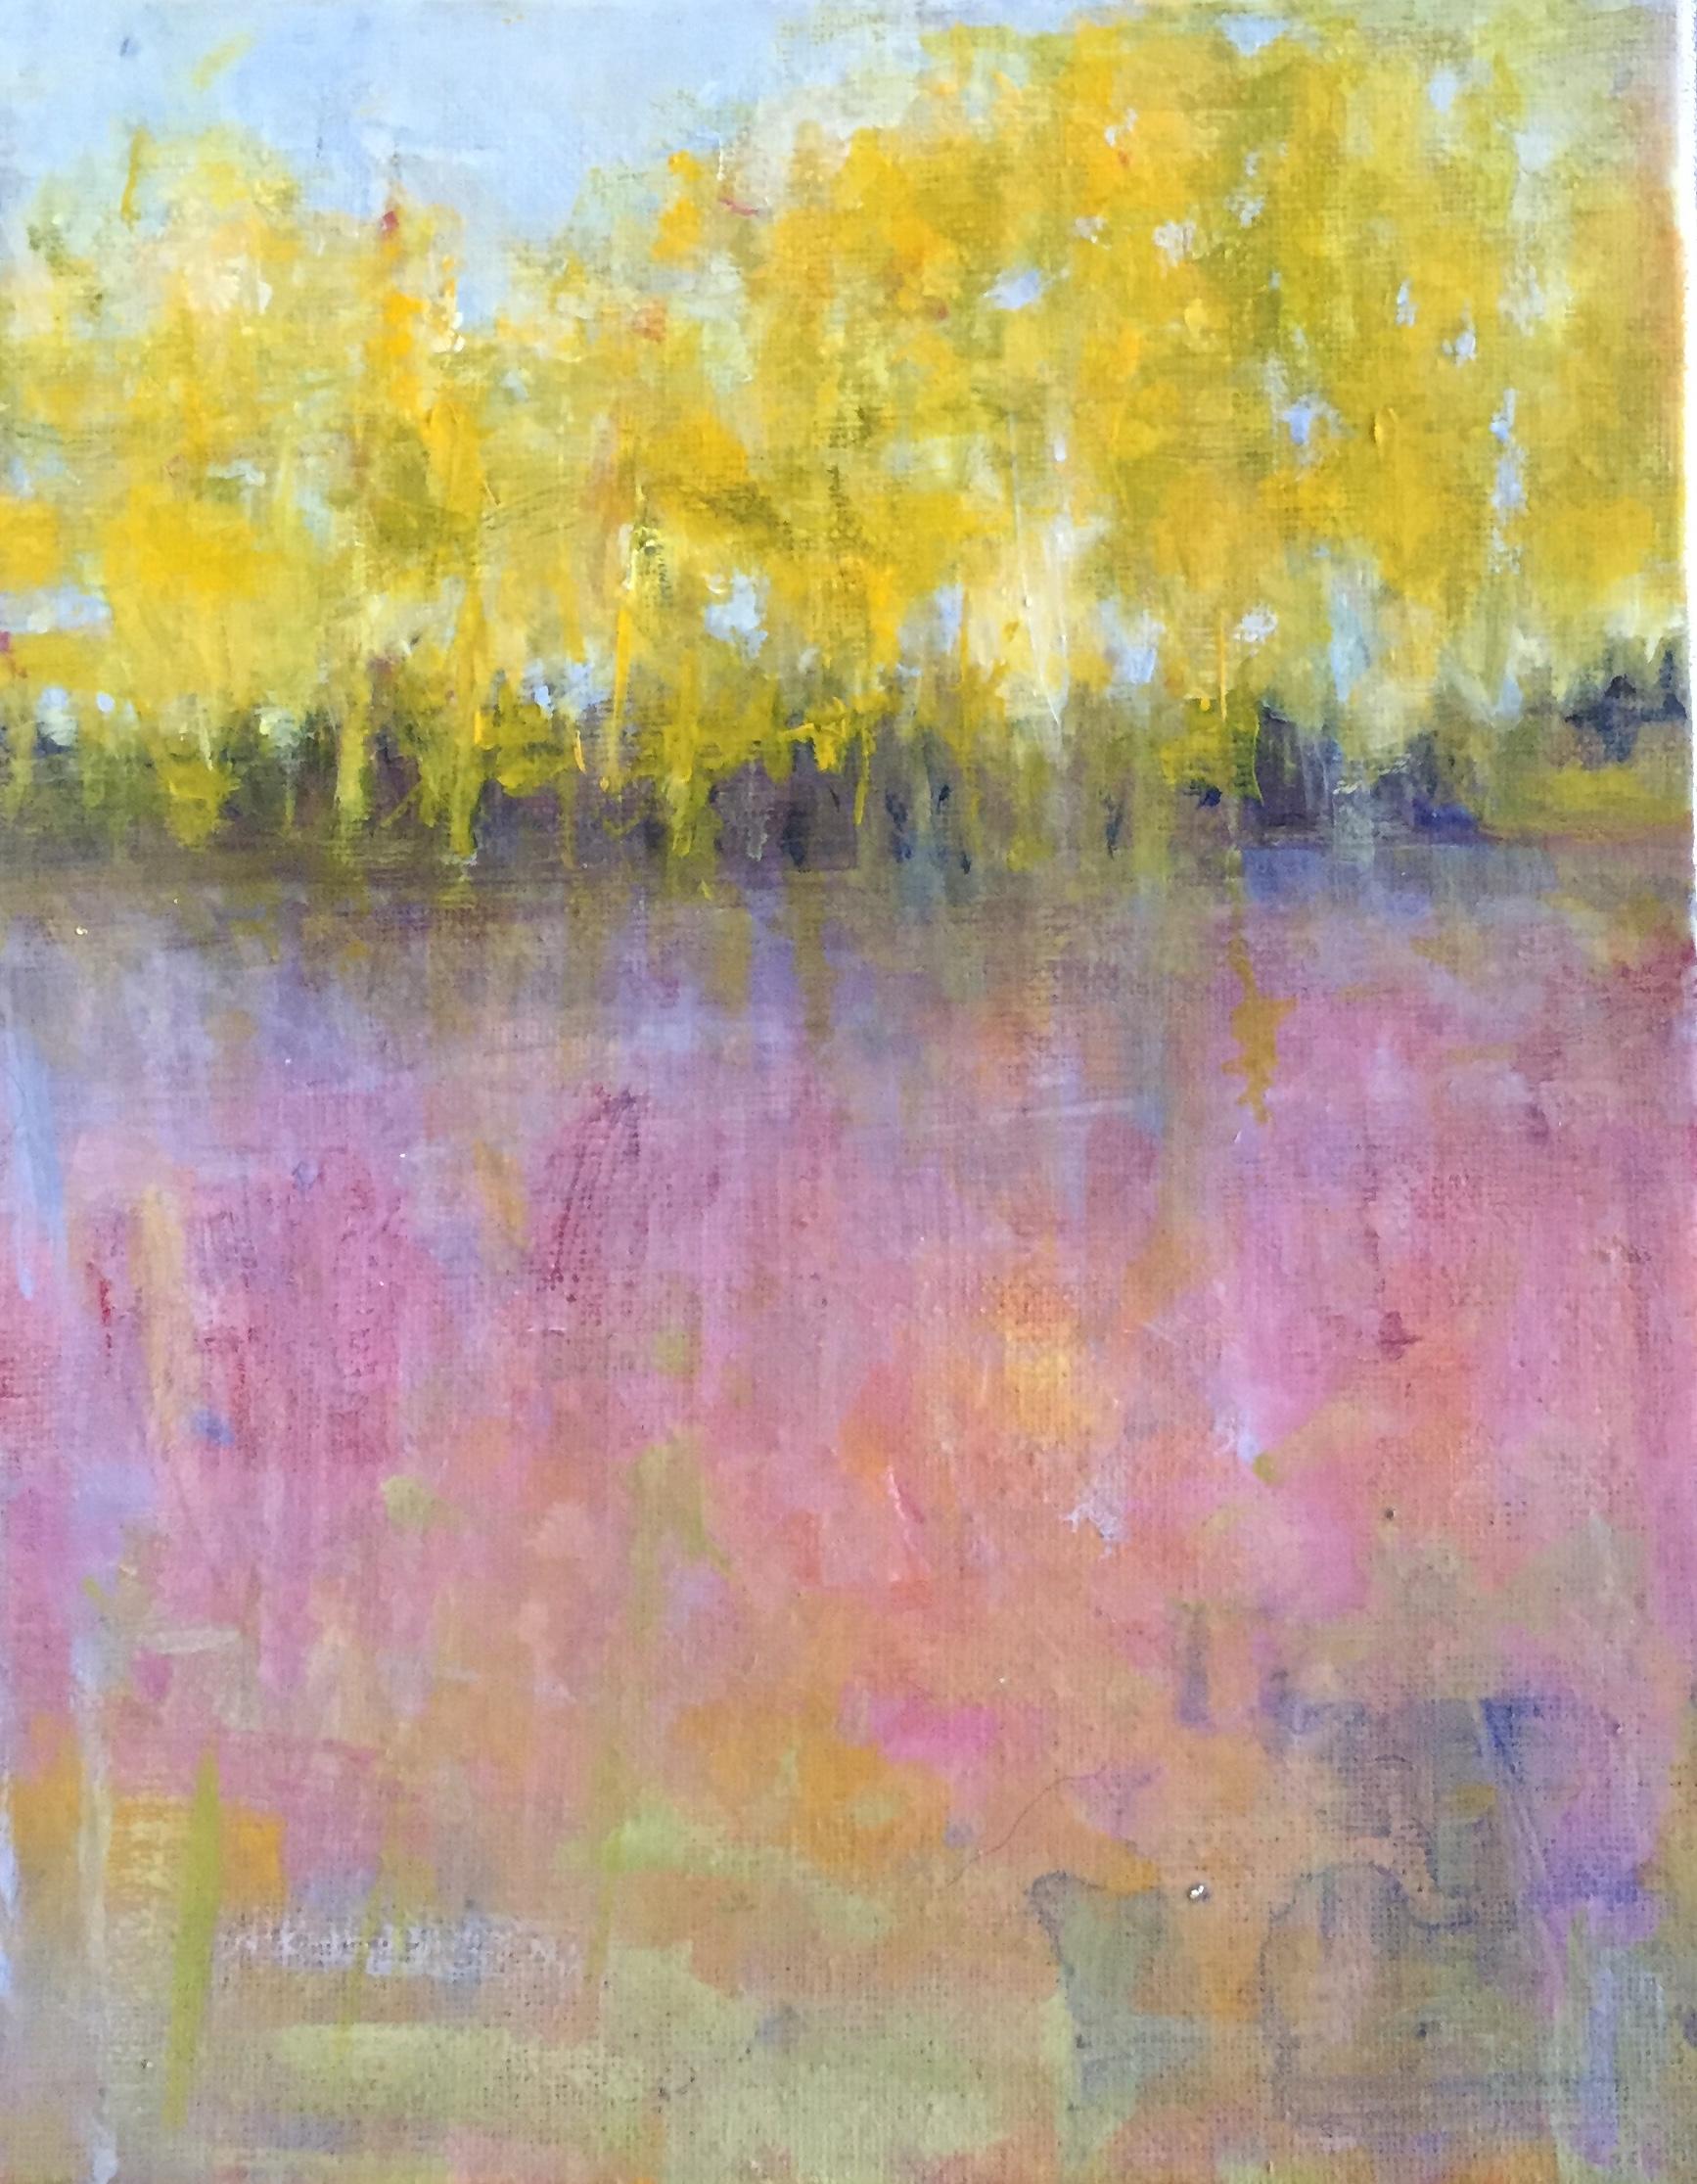 Birch Row#Acrylic on Canvas#10 x 8 Inches#$325